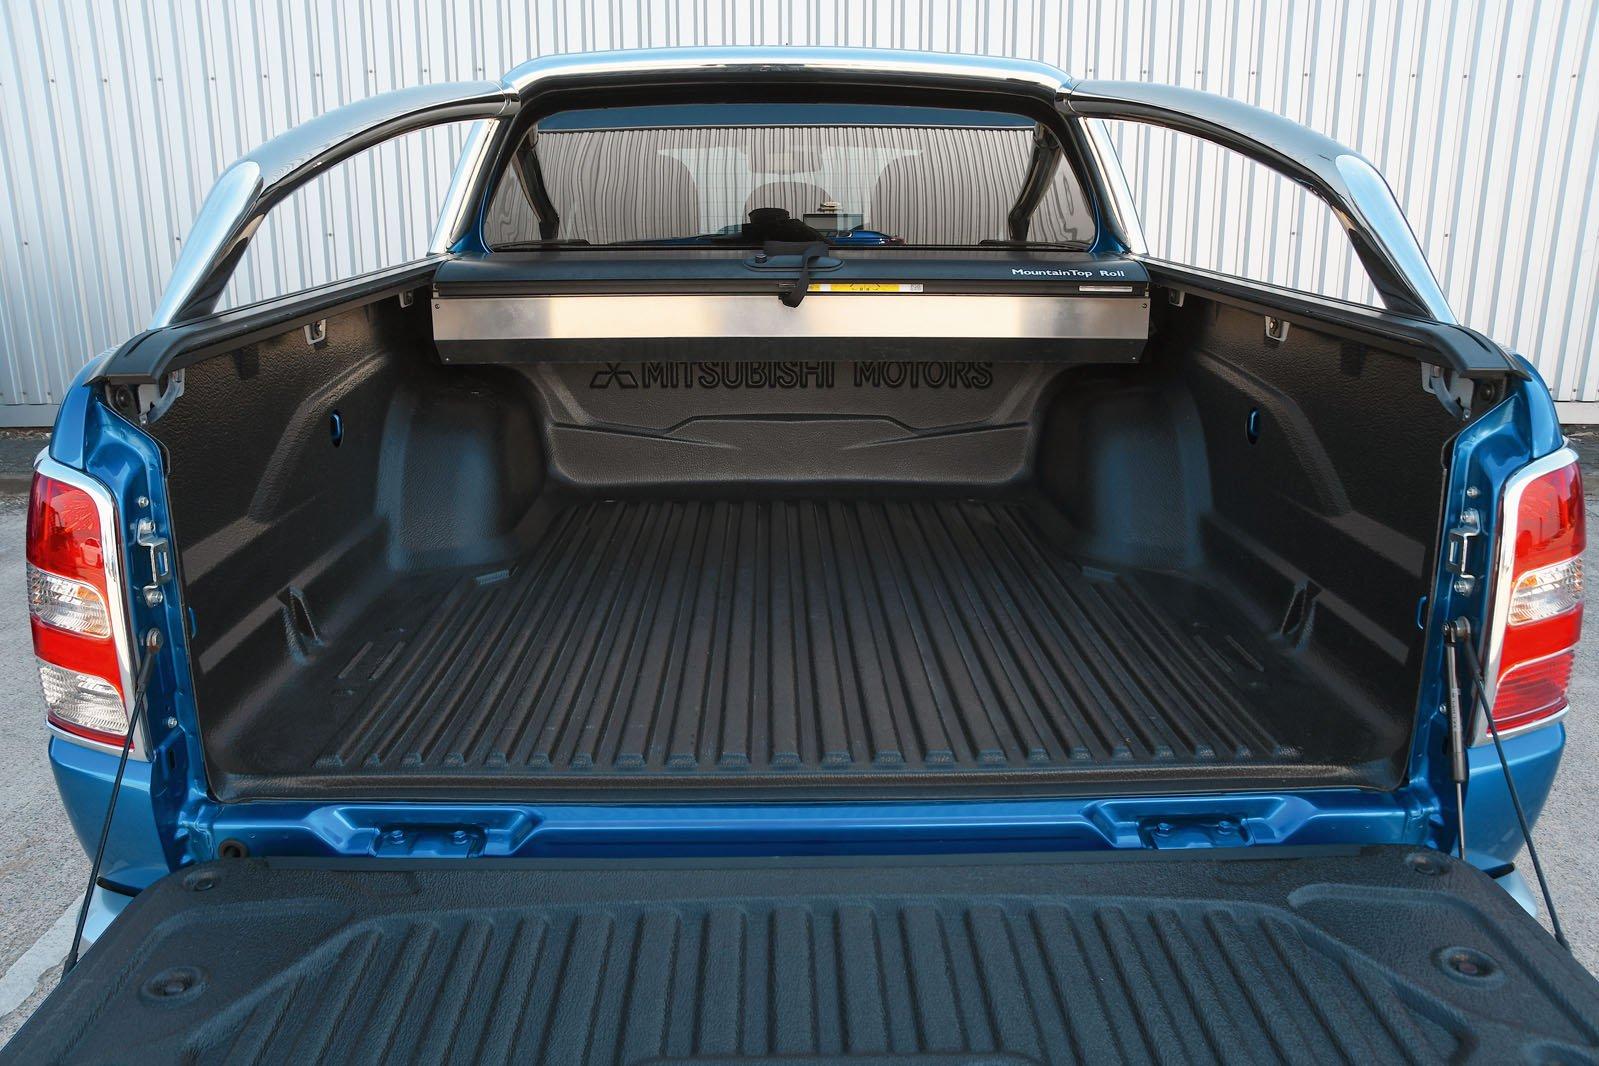 Used Mitsubishi L200 Review - 2015-present Reliability, Common